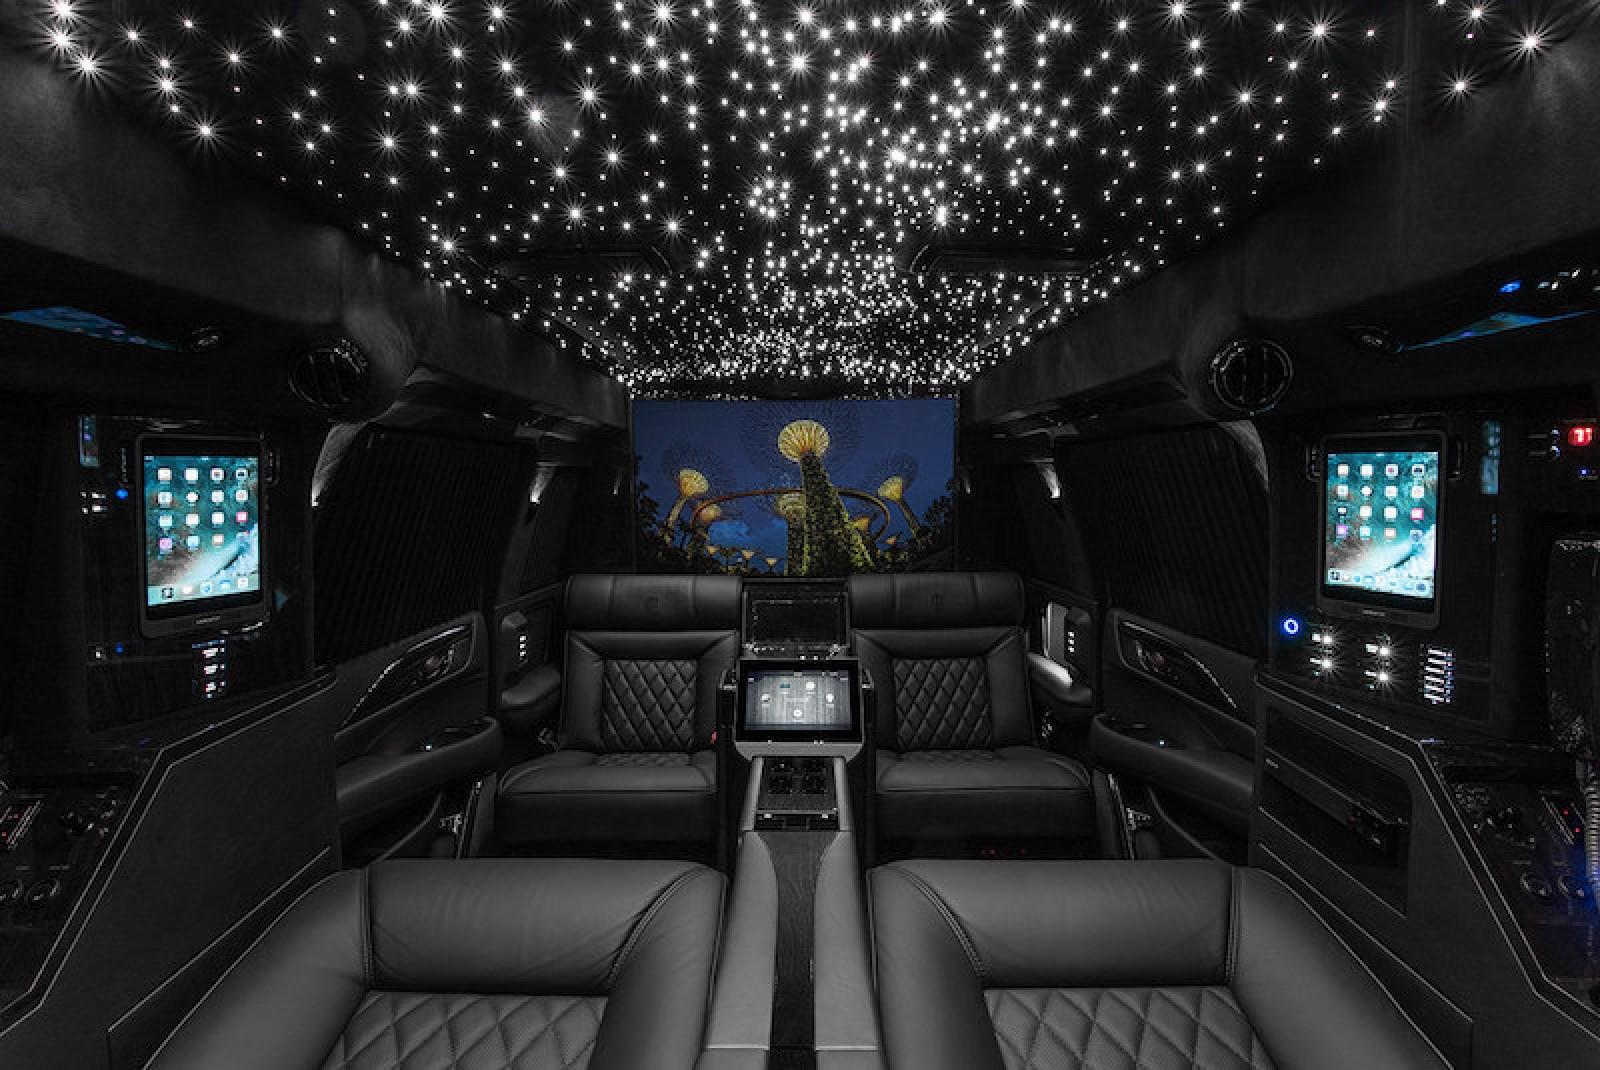 Hyper Luxury 2019 Cadillac Escalade Retrofitted With